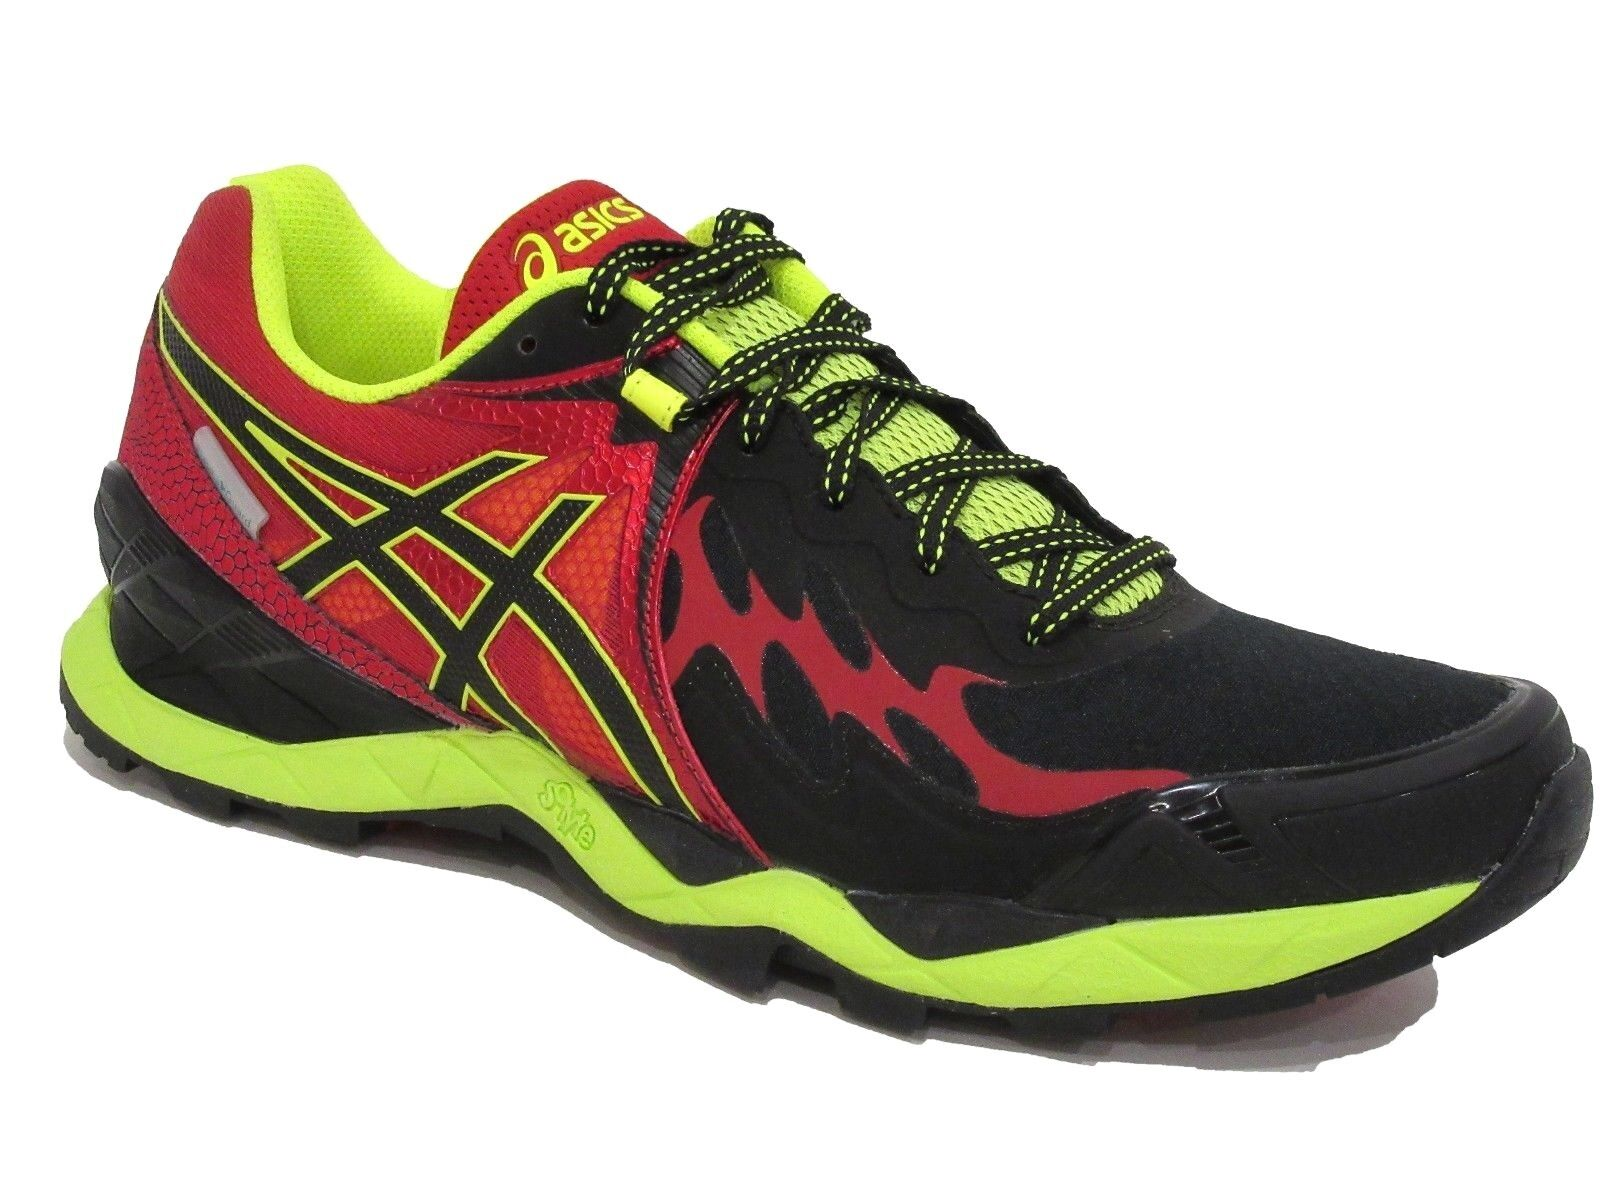 Asics Hombre Gel Fuji Endurance calzado para correr, negro rojo ónix Racing